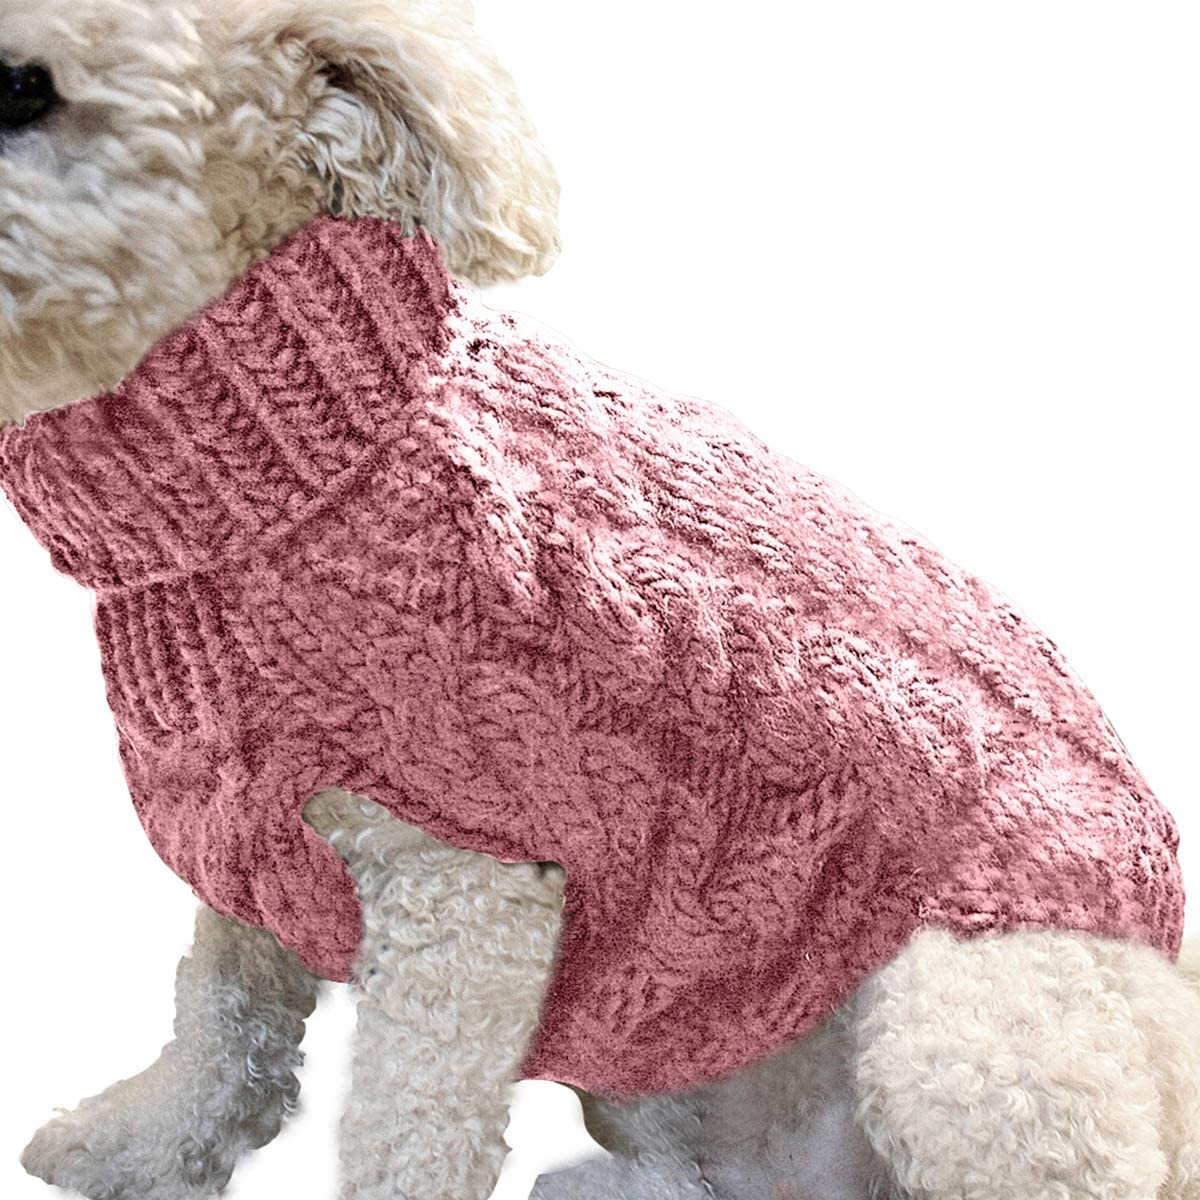 Homeriy Pet Dog Knitted Braid Turtleneck Turtlenec Max 71% OFF Dedication Sweater Plait